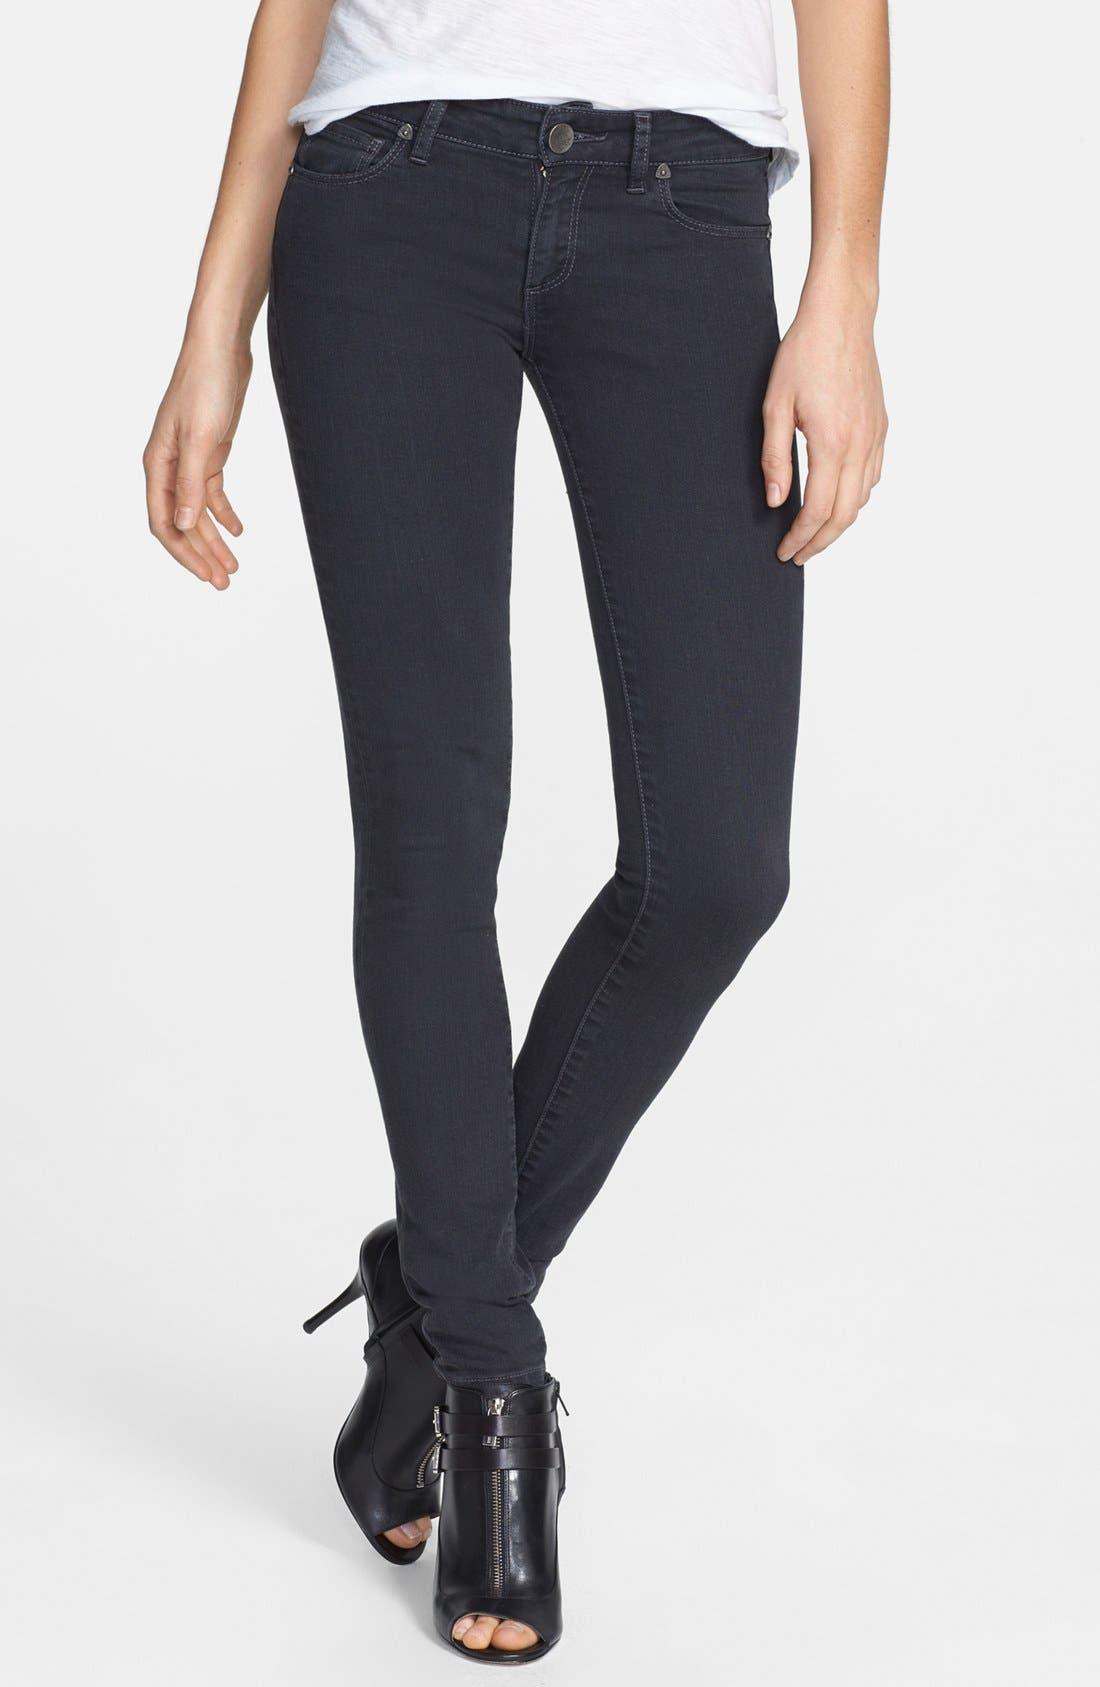 Alternate Image 1 Selected - KUT from the Kloth 'Elle' Skinny Jeans (Interest)